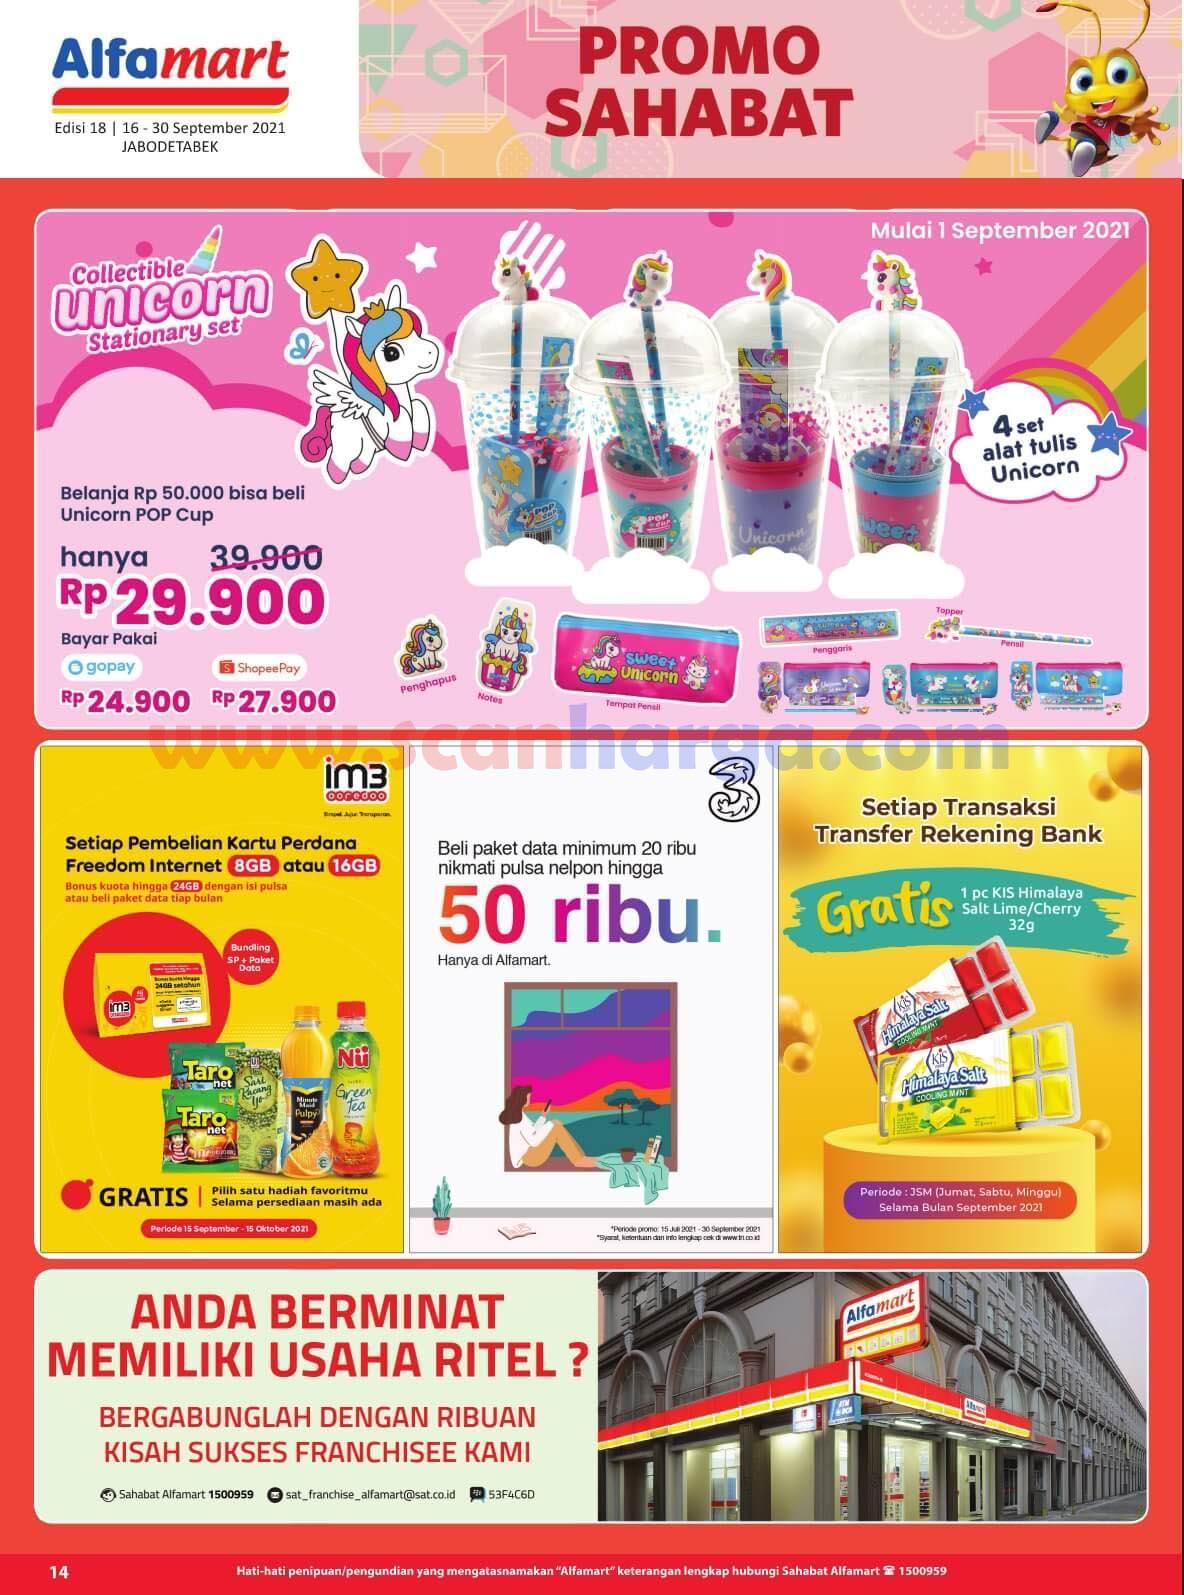 Katalog Promo Alfamart 16 - 30 September 2021 14